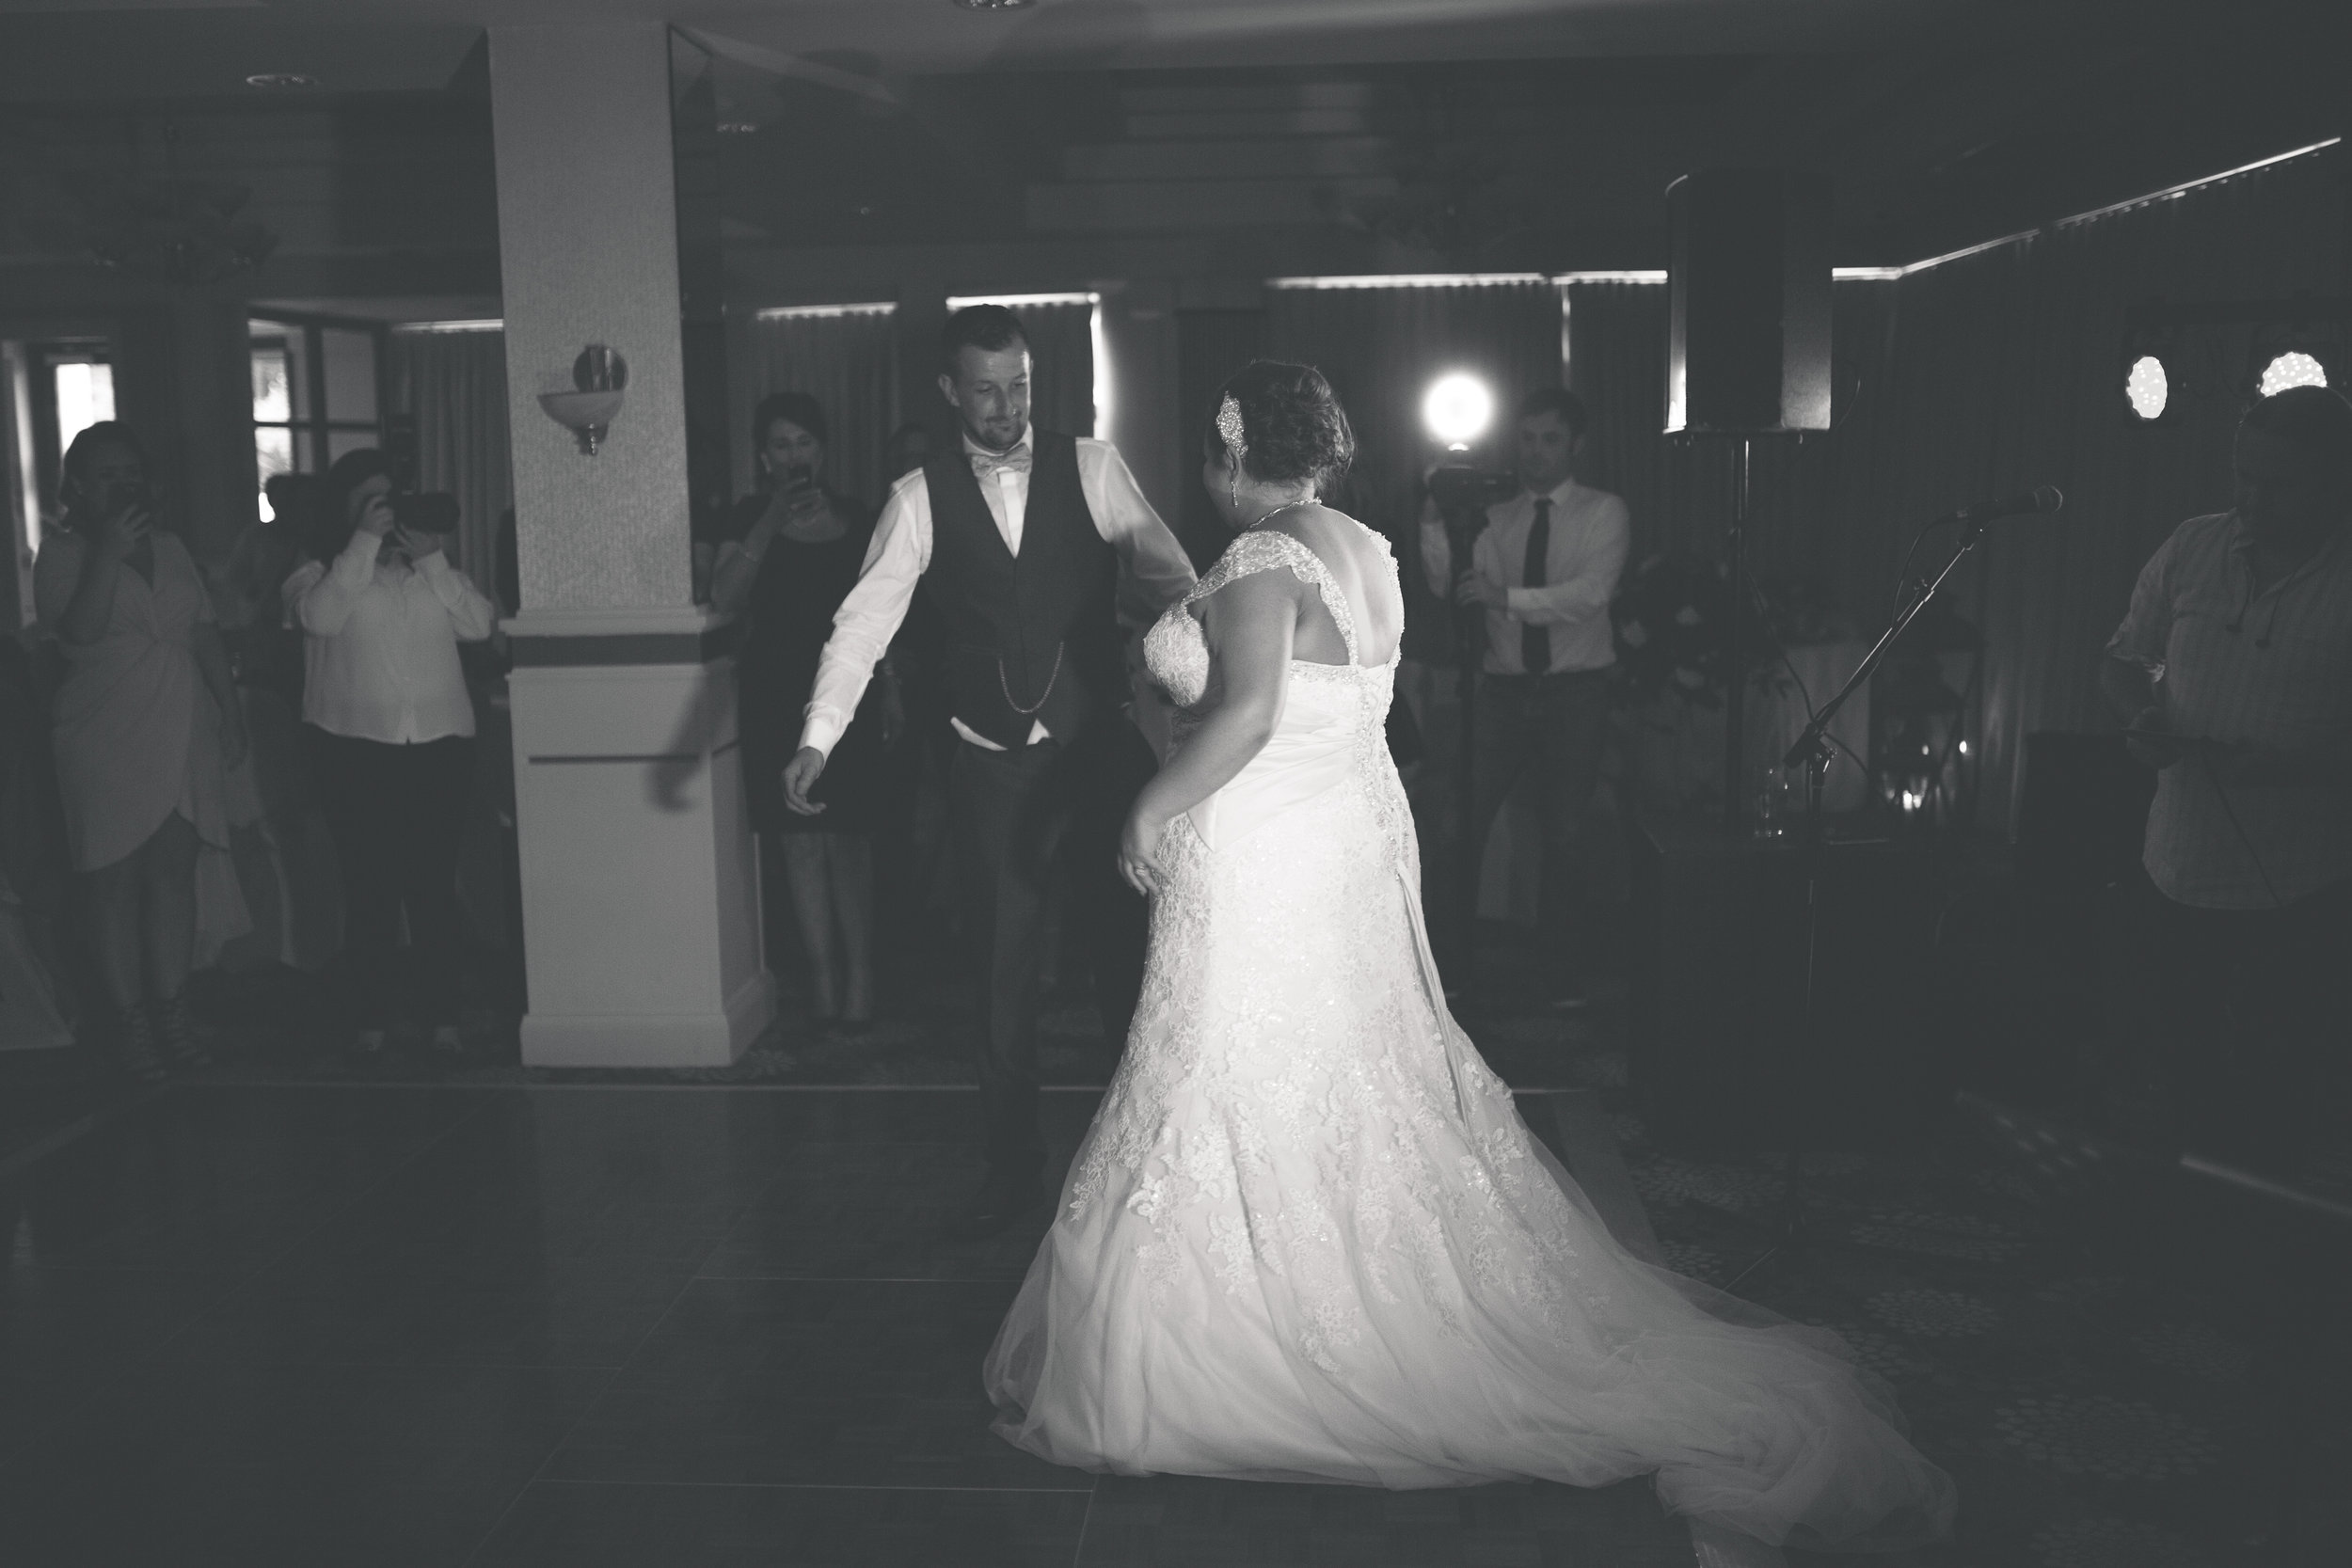 Antoinette & Stephen - First Dance | Brian McEwan Photography | Wedding Photographer Northern Ireland 3.jpg